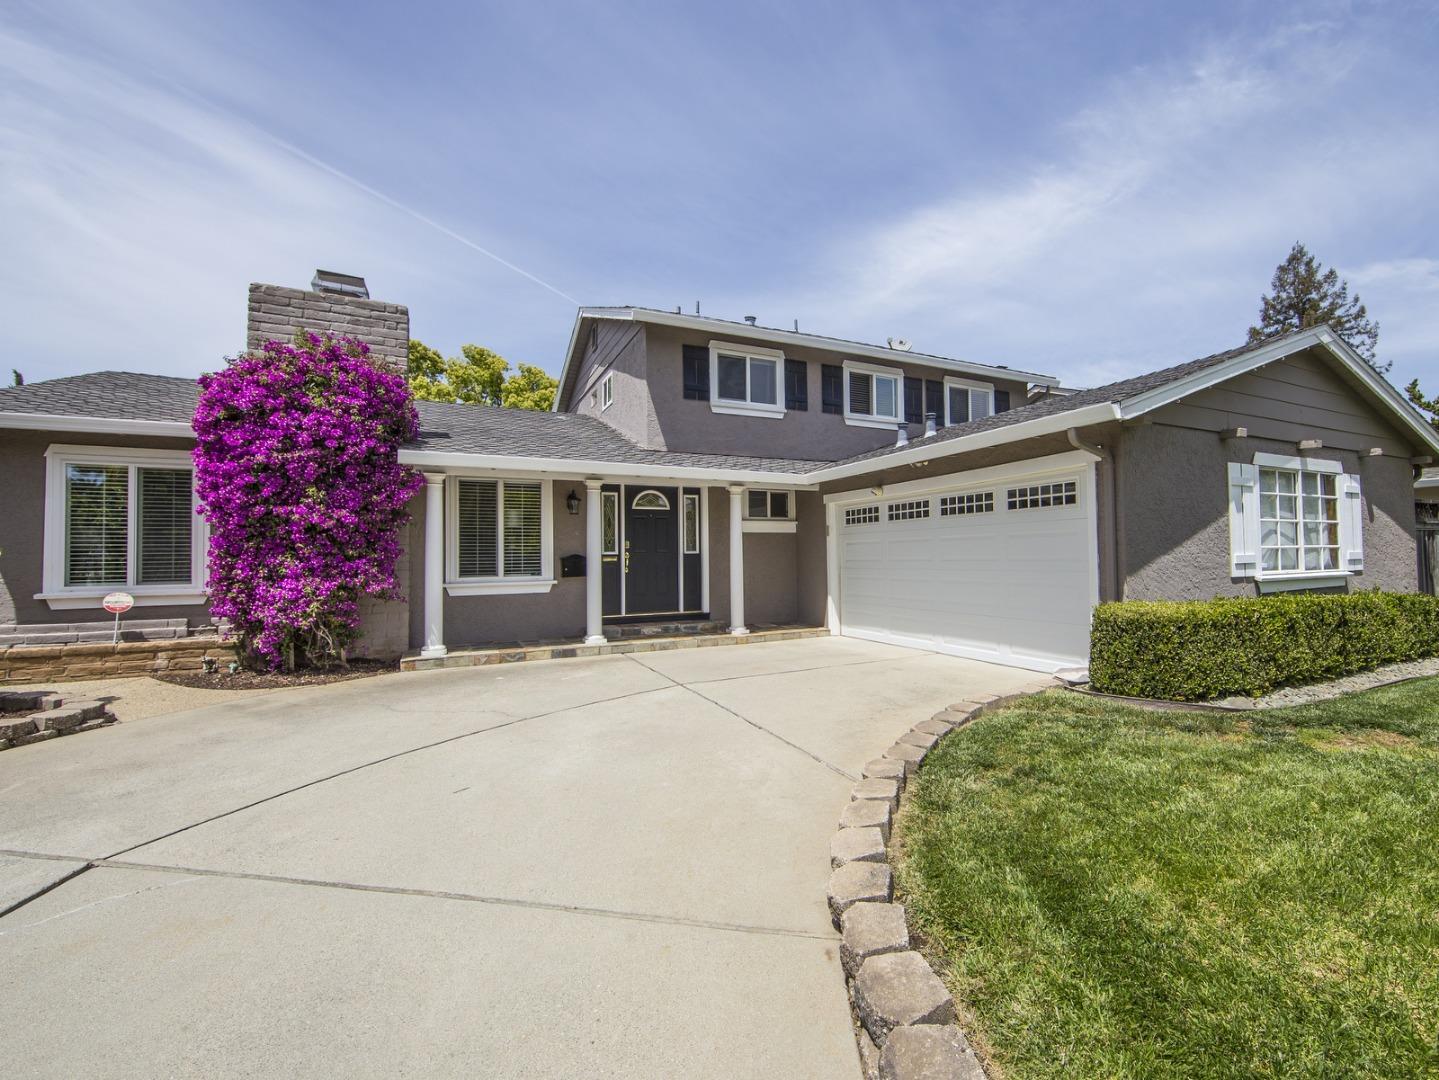 Property for sale at 6747 Mount Pakron DR, San Jose,  CA 95120